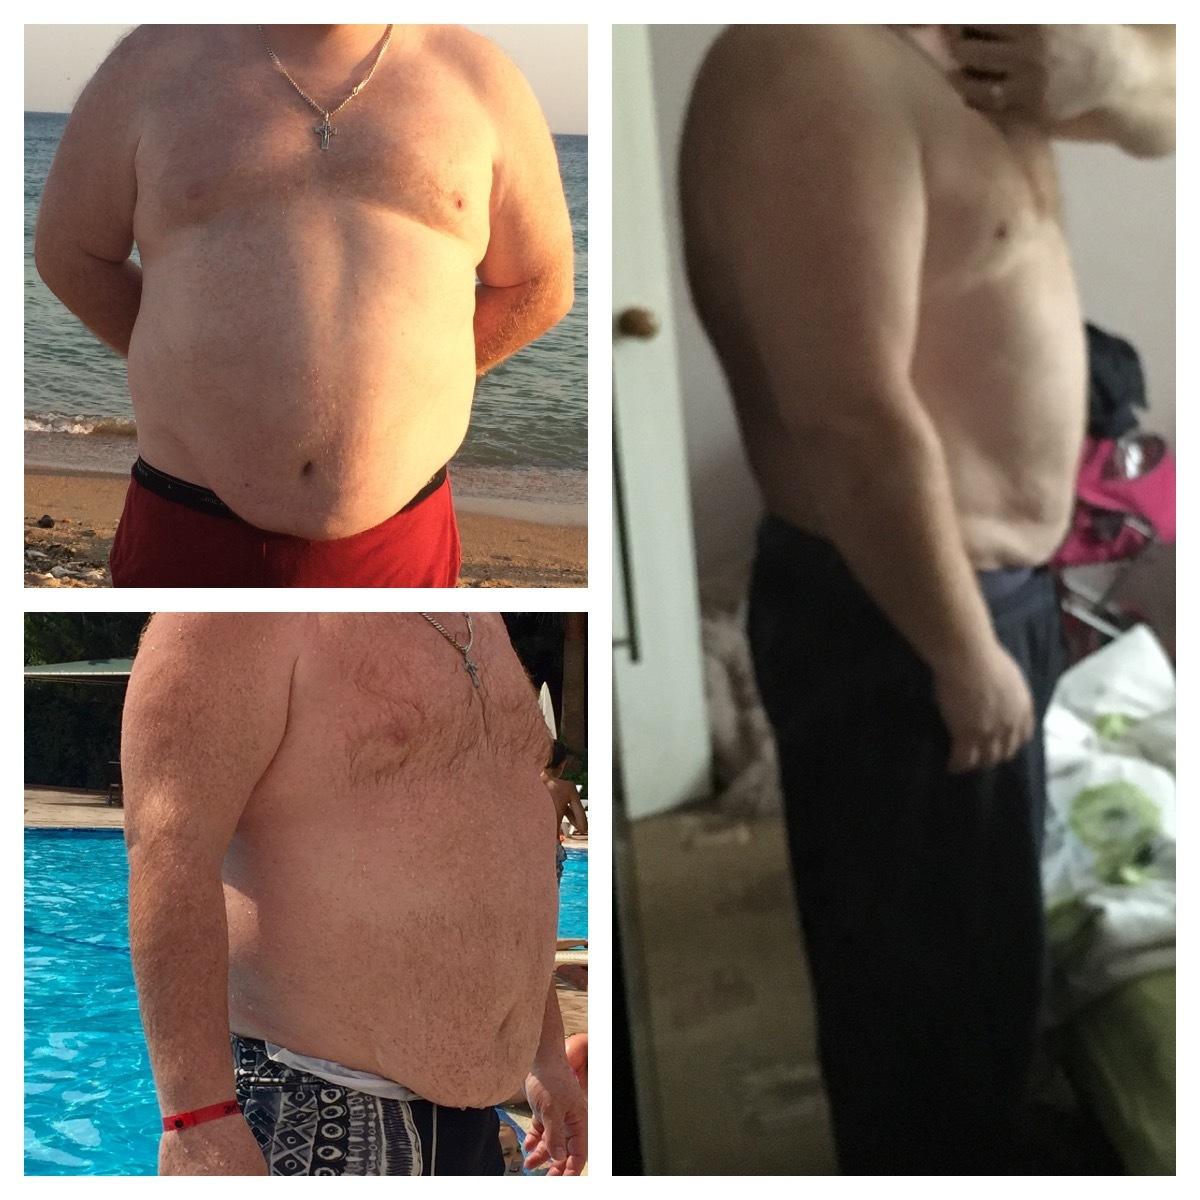 Болят суставы, позвоночник, вес 110кг диагностика артроза тазобедренного сустава